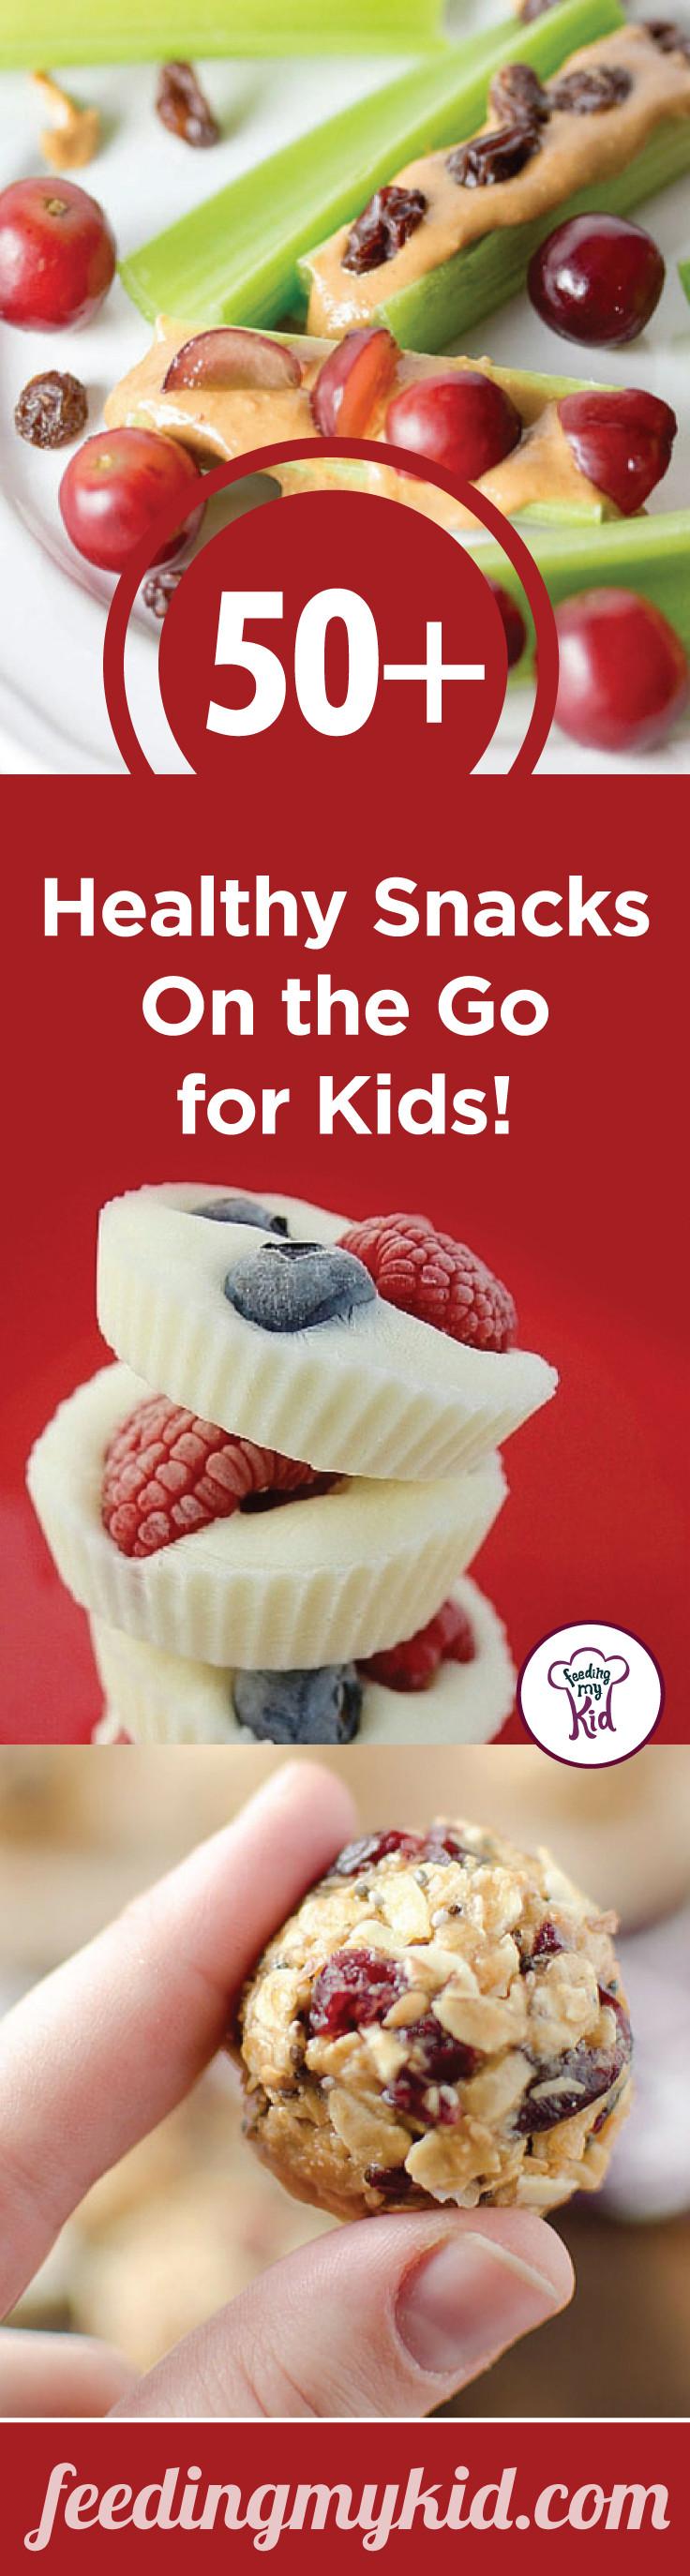 Easy Healthy Snacks On The Go  Easy Snacks for Kids 50 Healthy Snacks the Go